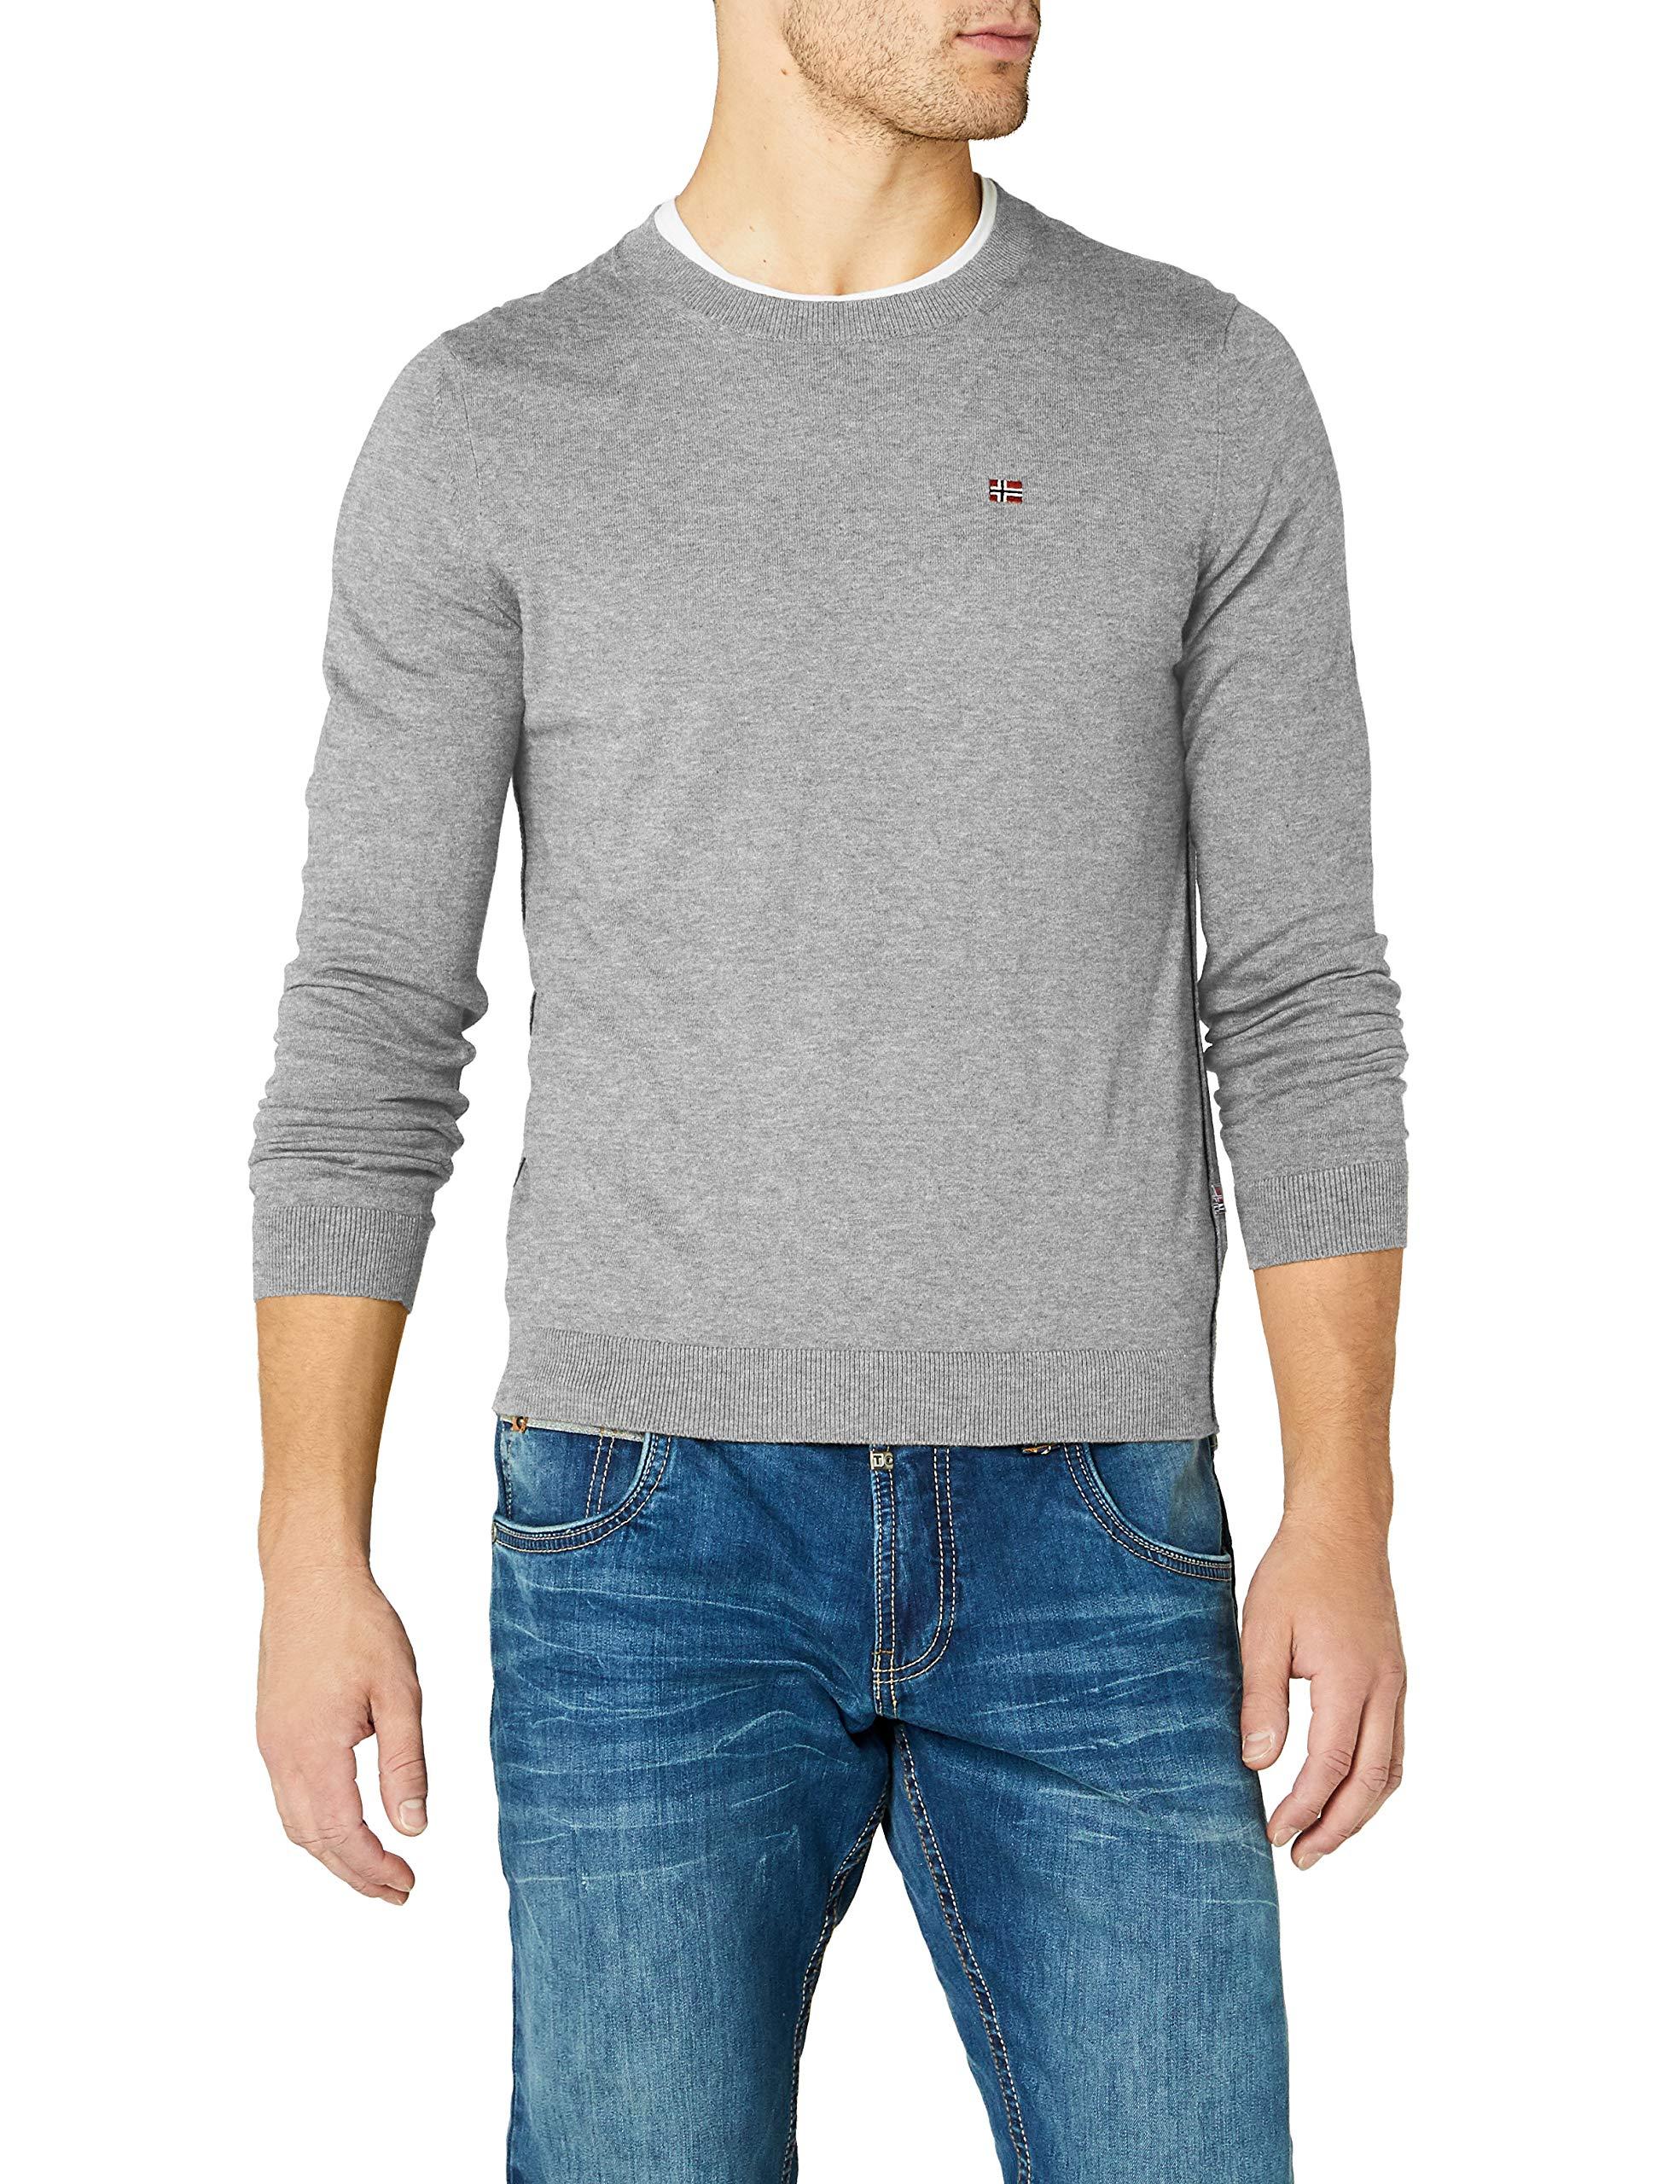 Mel Decatur Homme Grey NapapijriN0yhe6 1 Pull Grismed 160TailleXl thsQrdC